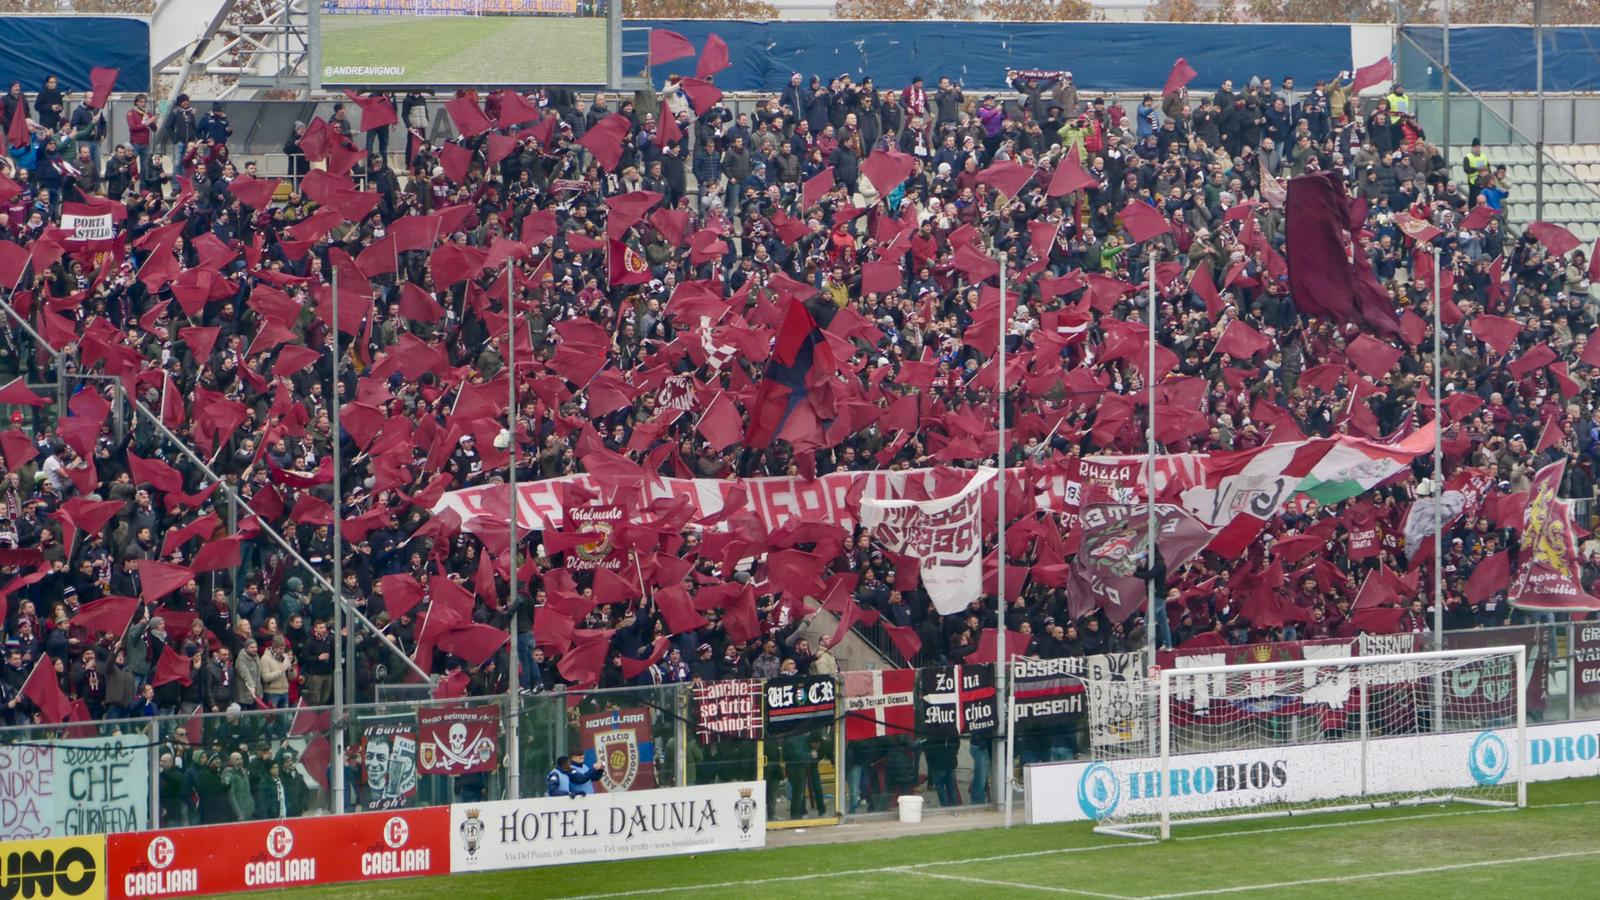 modena-reggio-audace-derby-5.jpeg